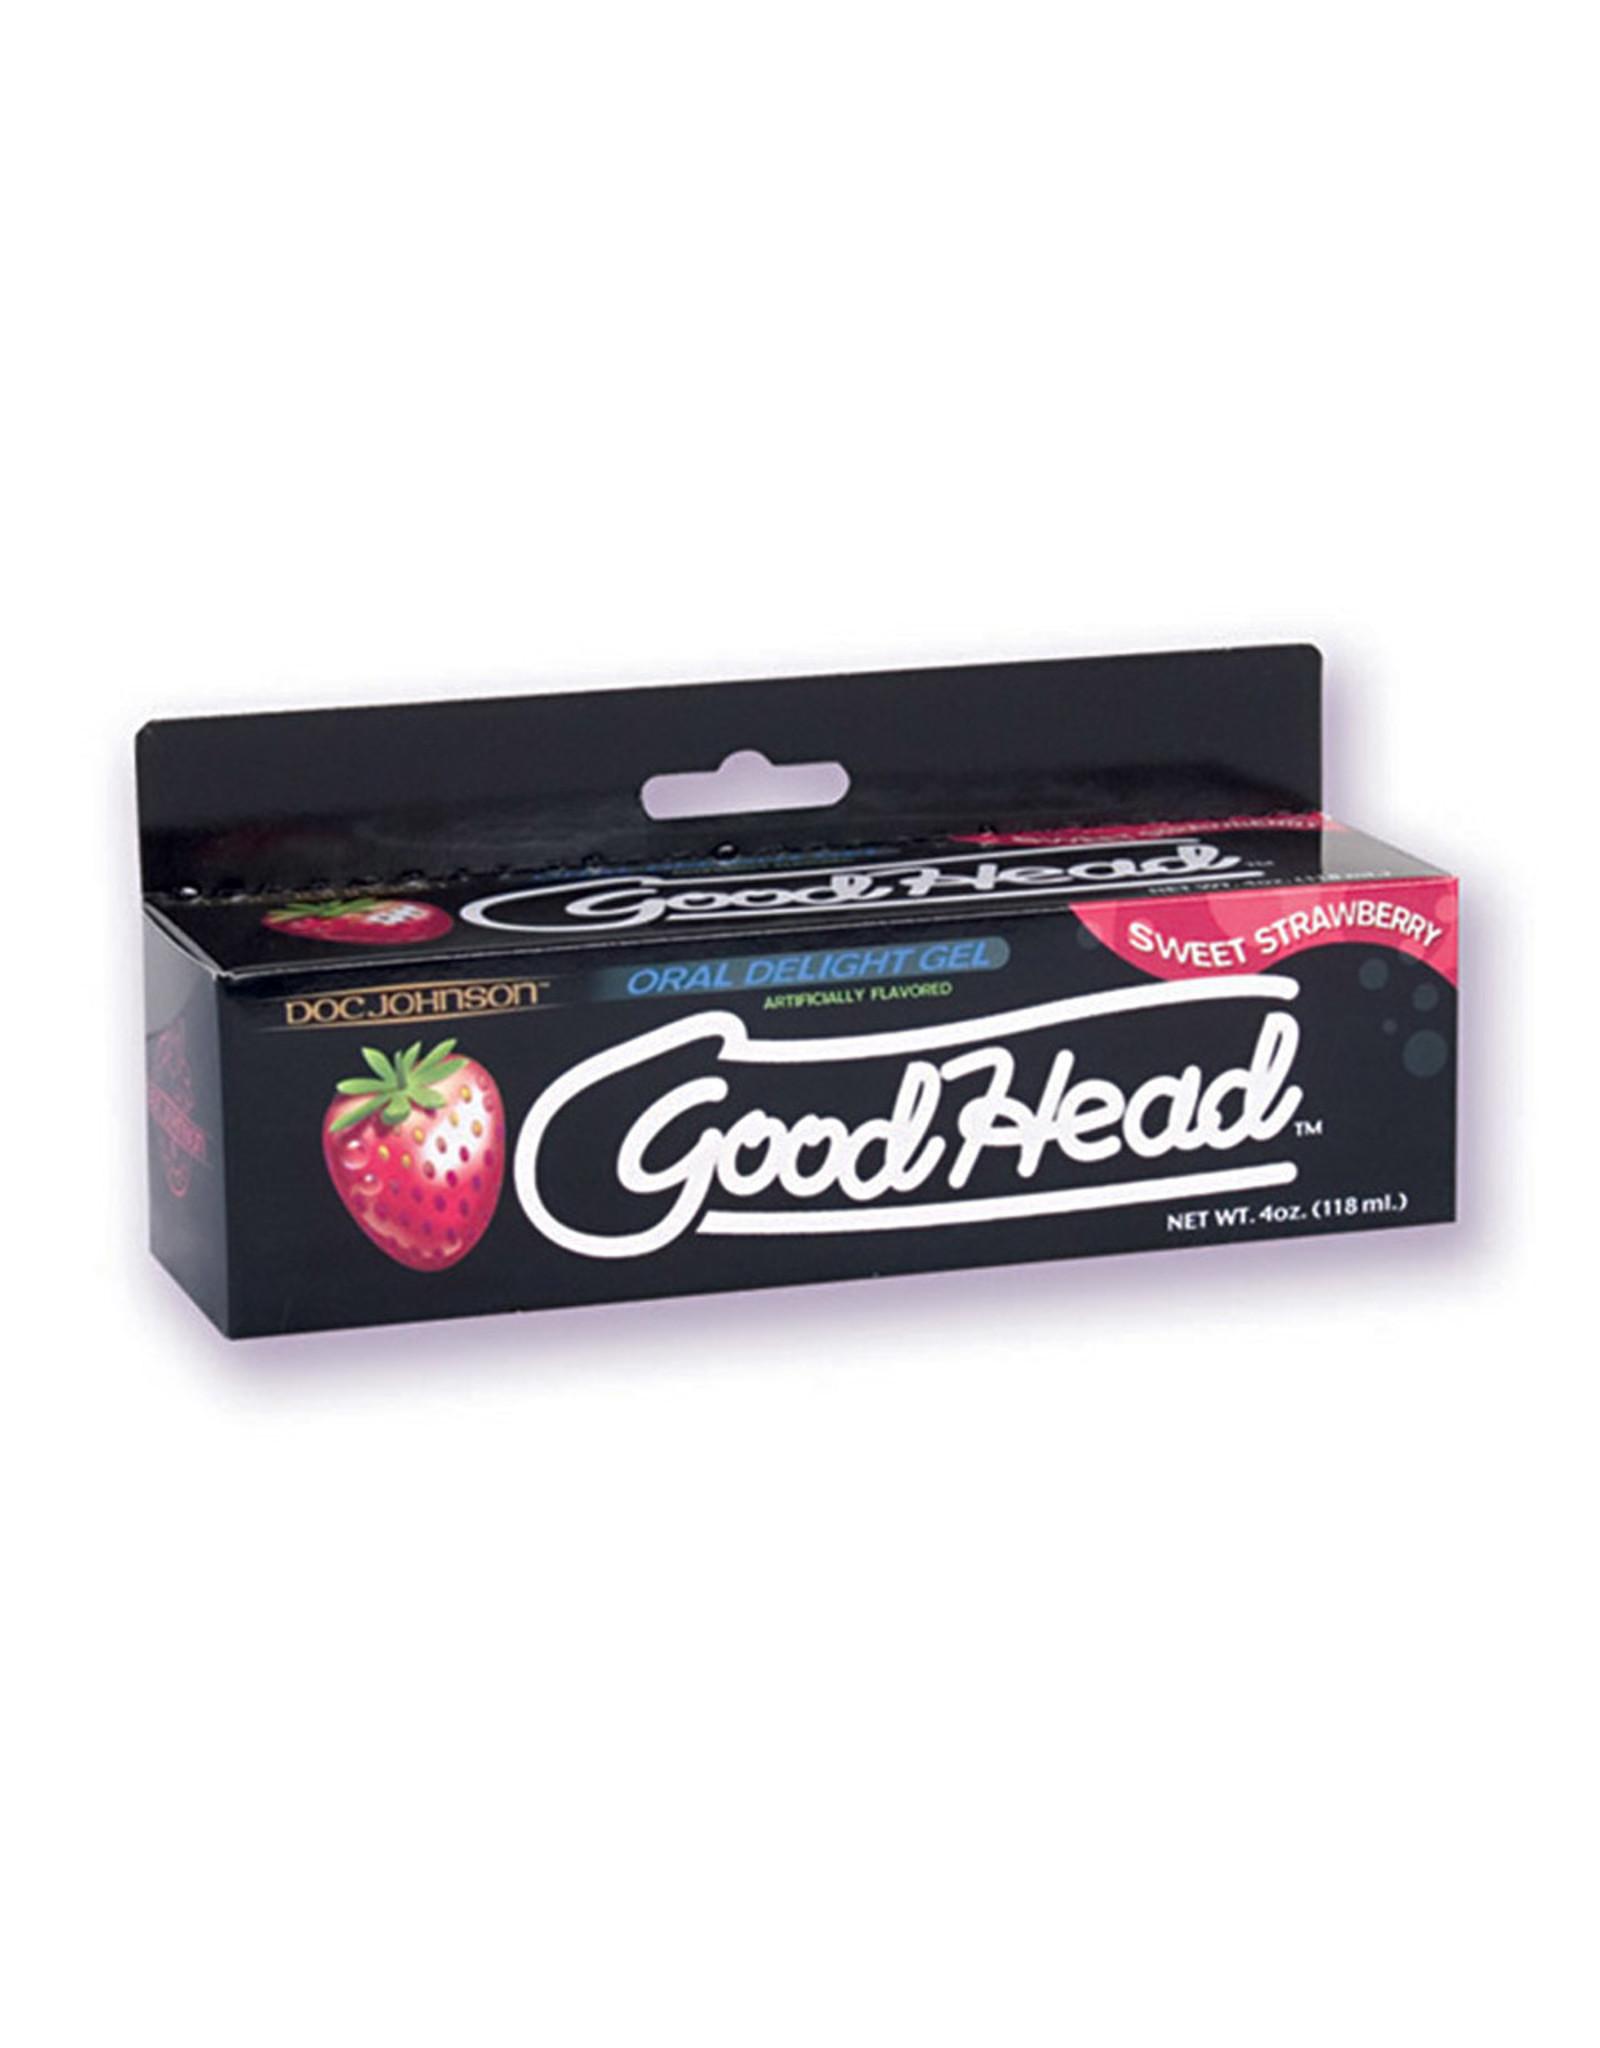 GOOD HEAD - ORAL DELIGHT GEL - SWEET STRAWBERRY 4oz